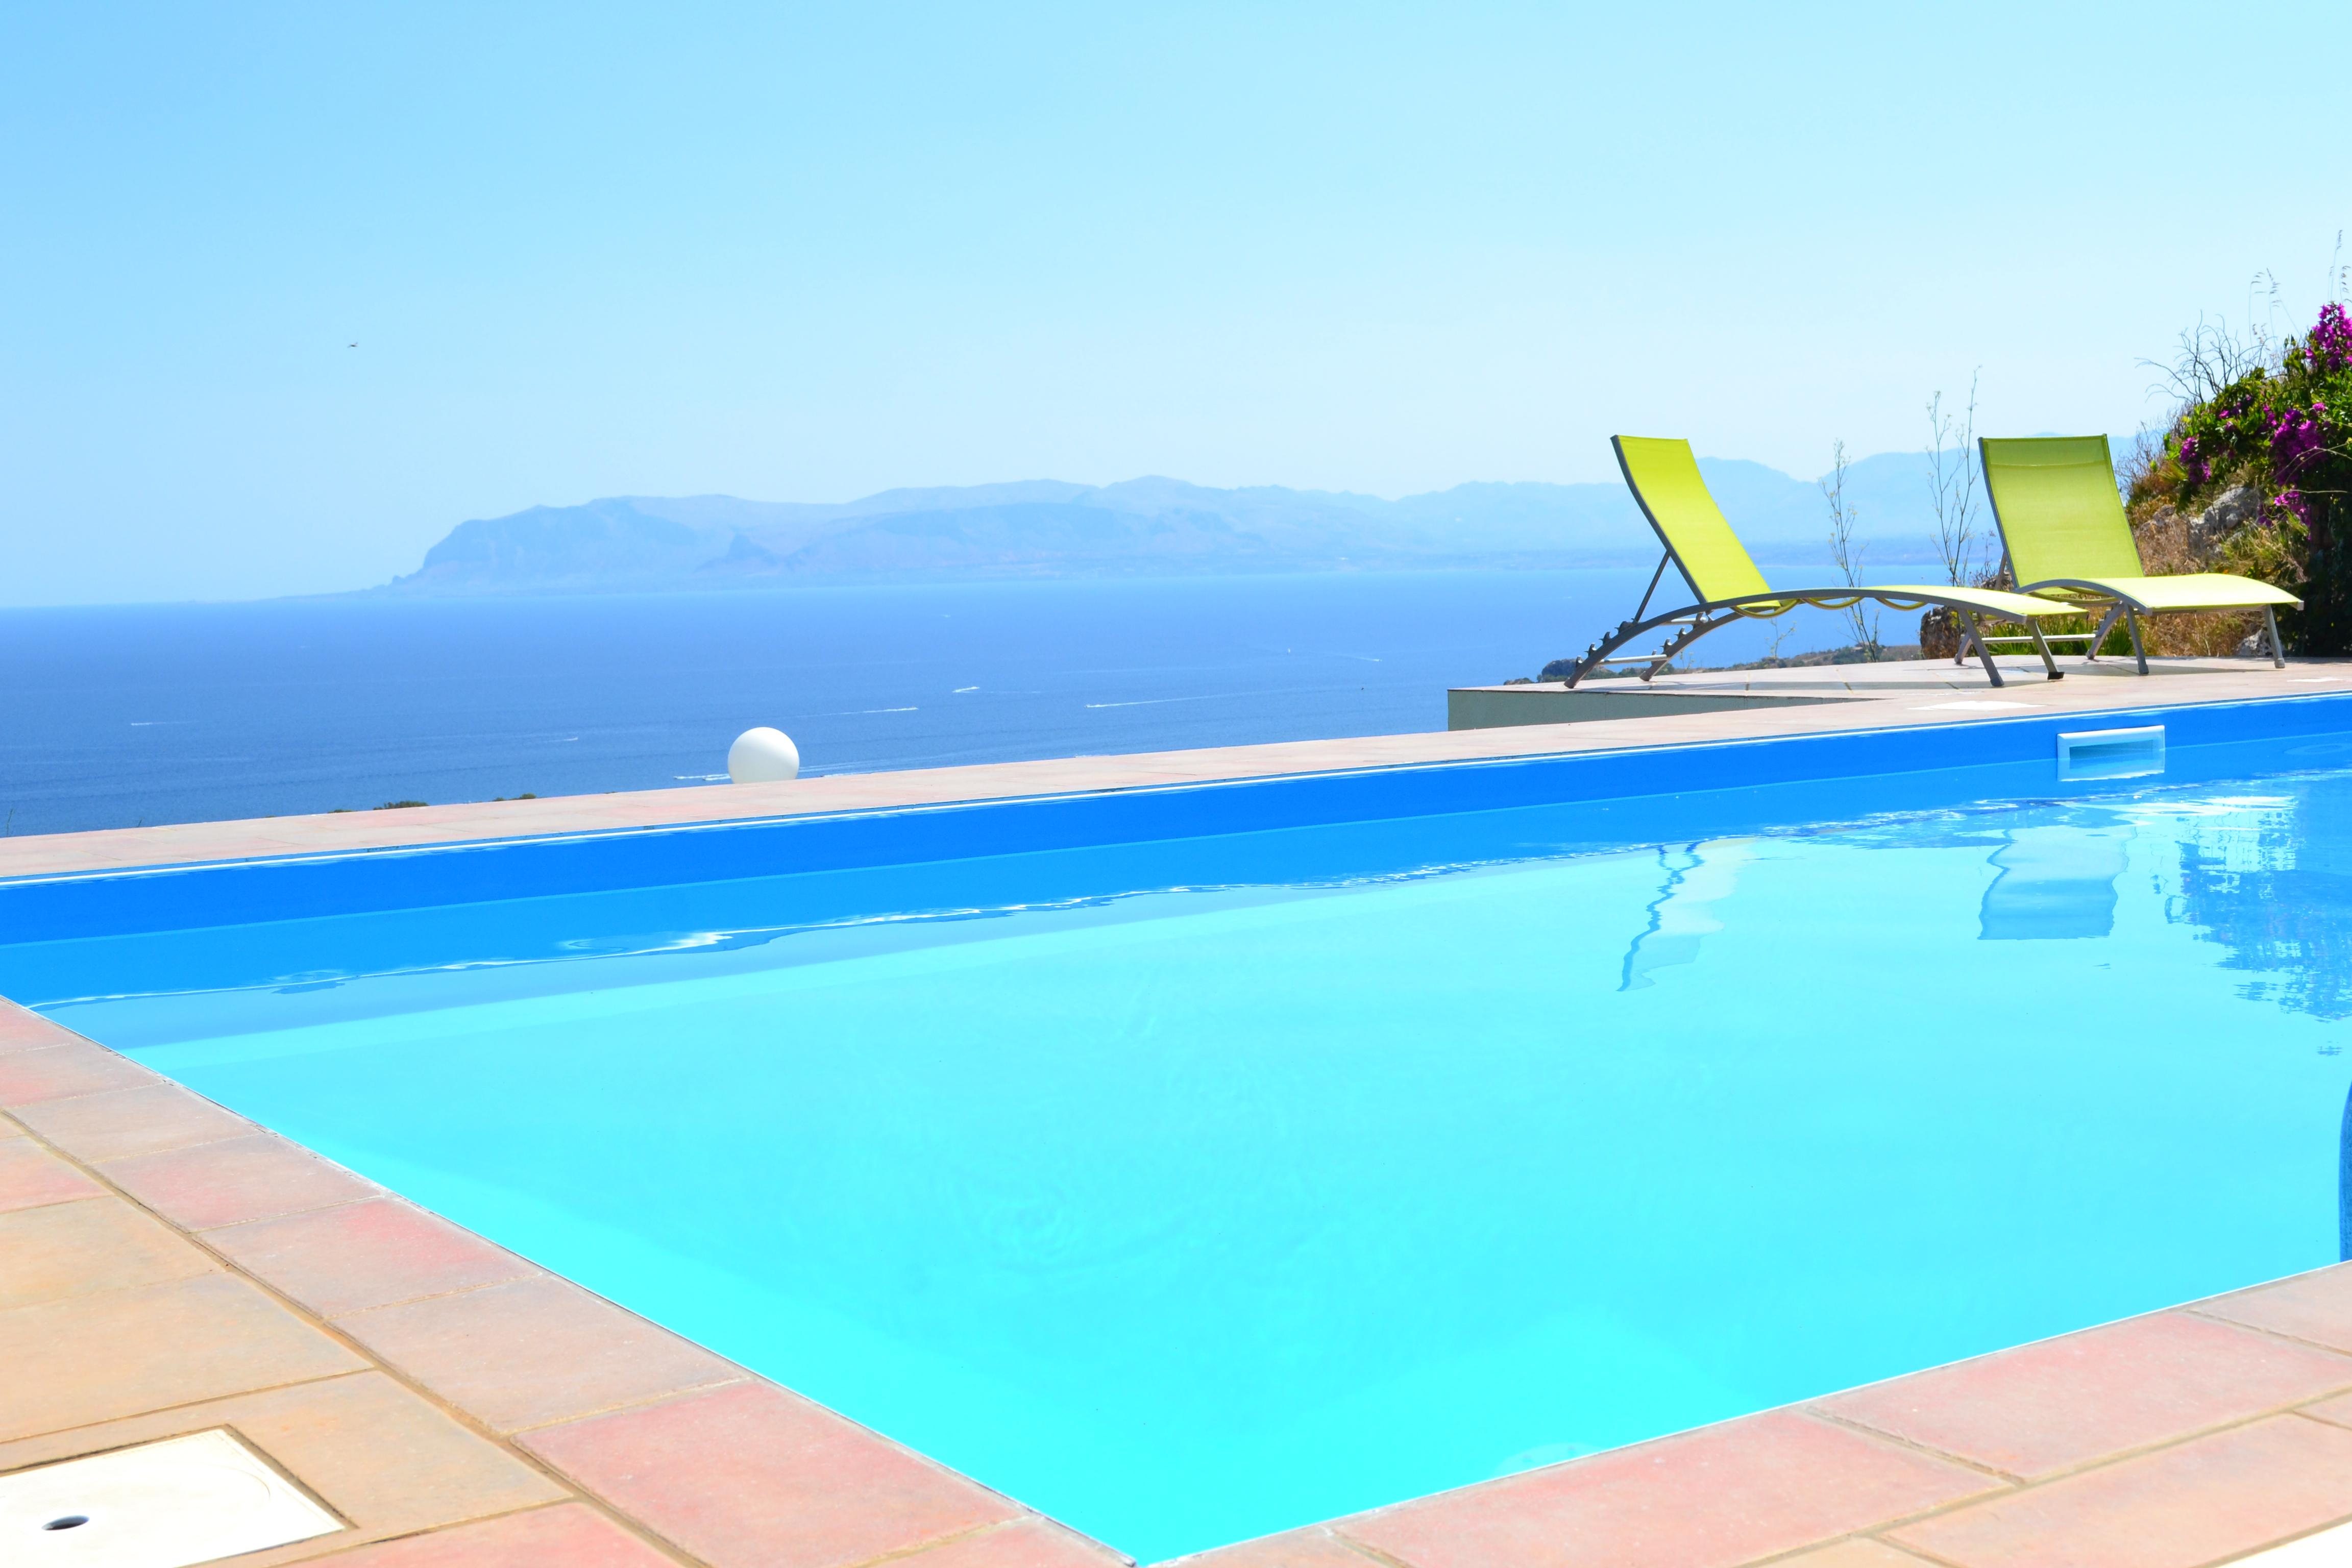 Vendita Piscine A Catania video costruzione piscine — > vendita piscine agrigento